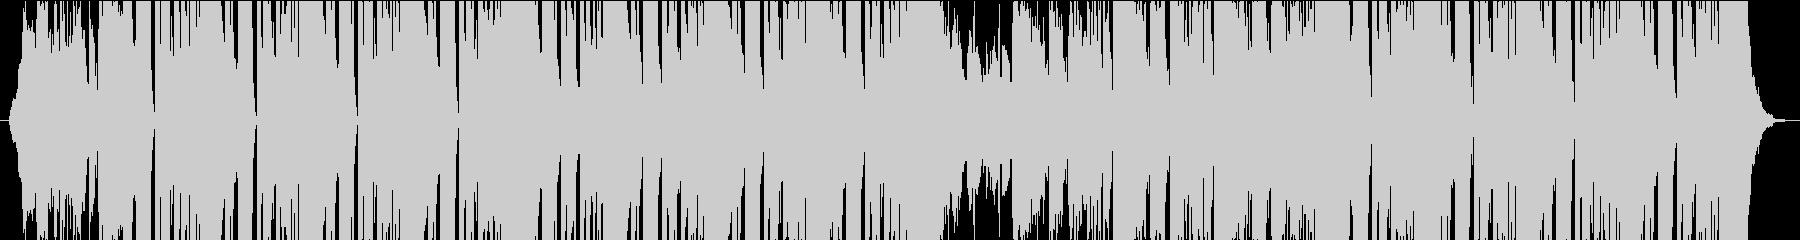 Trap Backgroundの未再生の波形